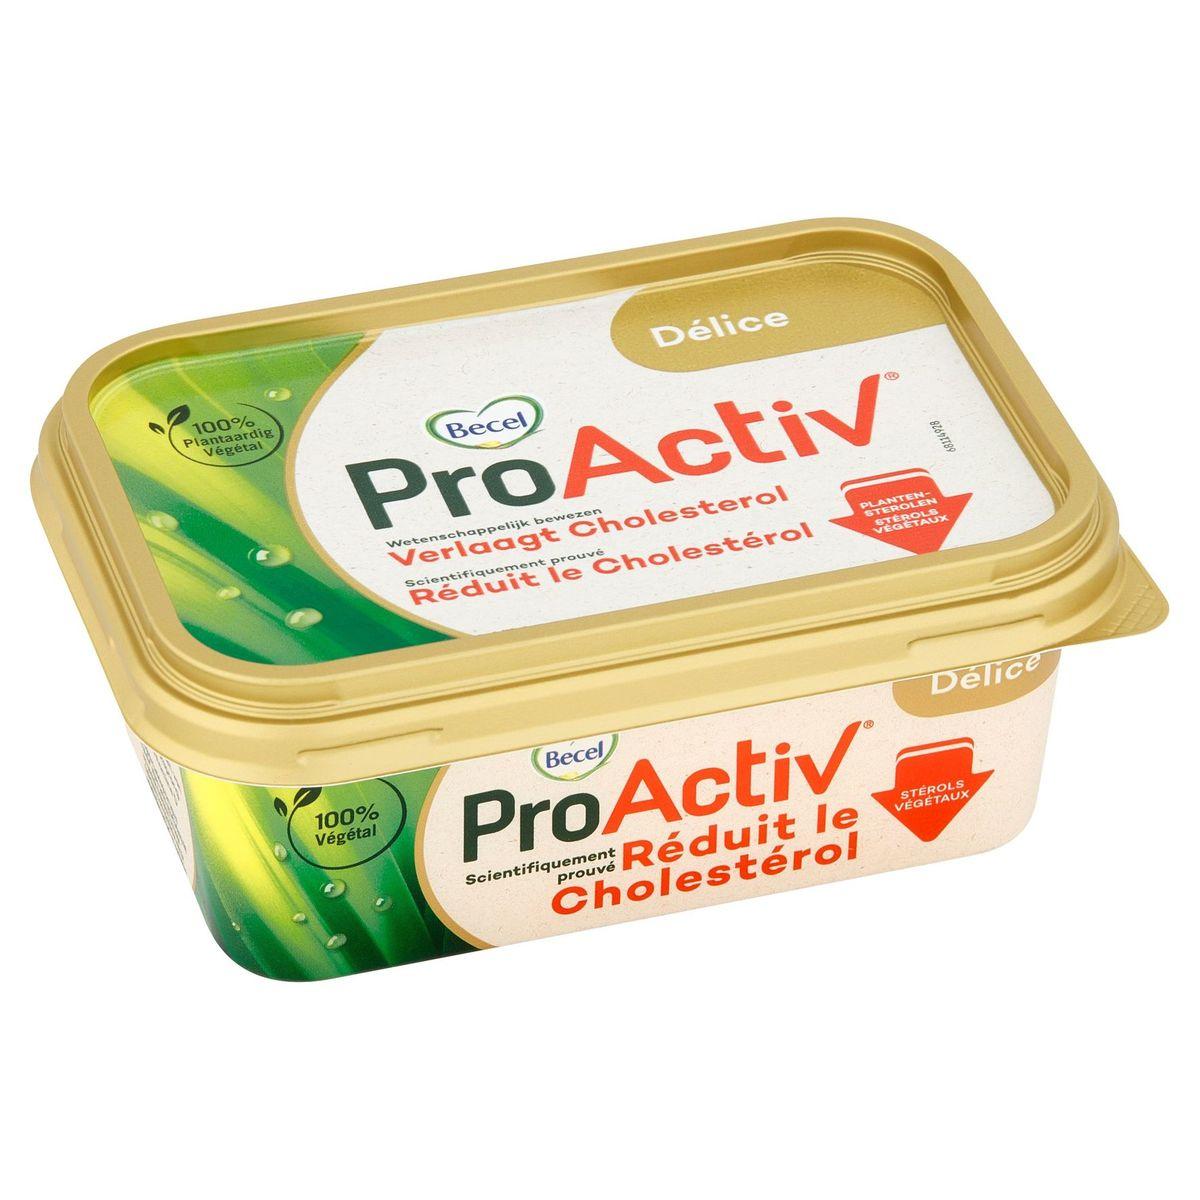 Becel ProActiv Délice 250 g